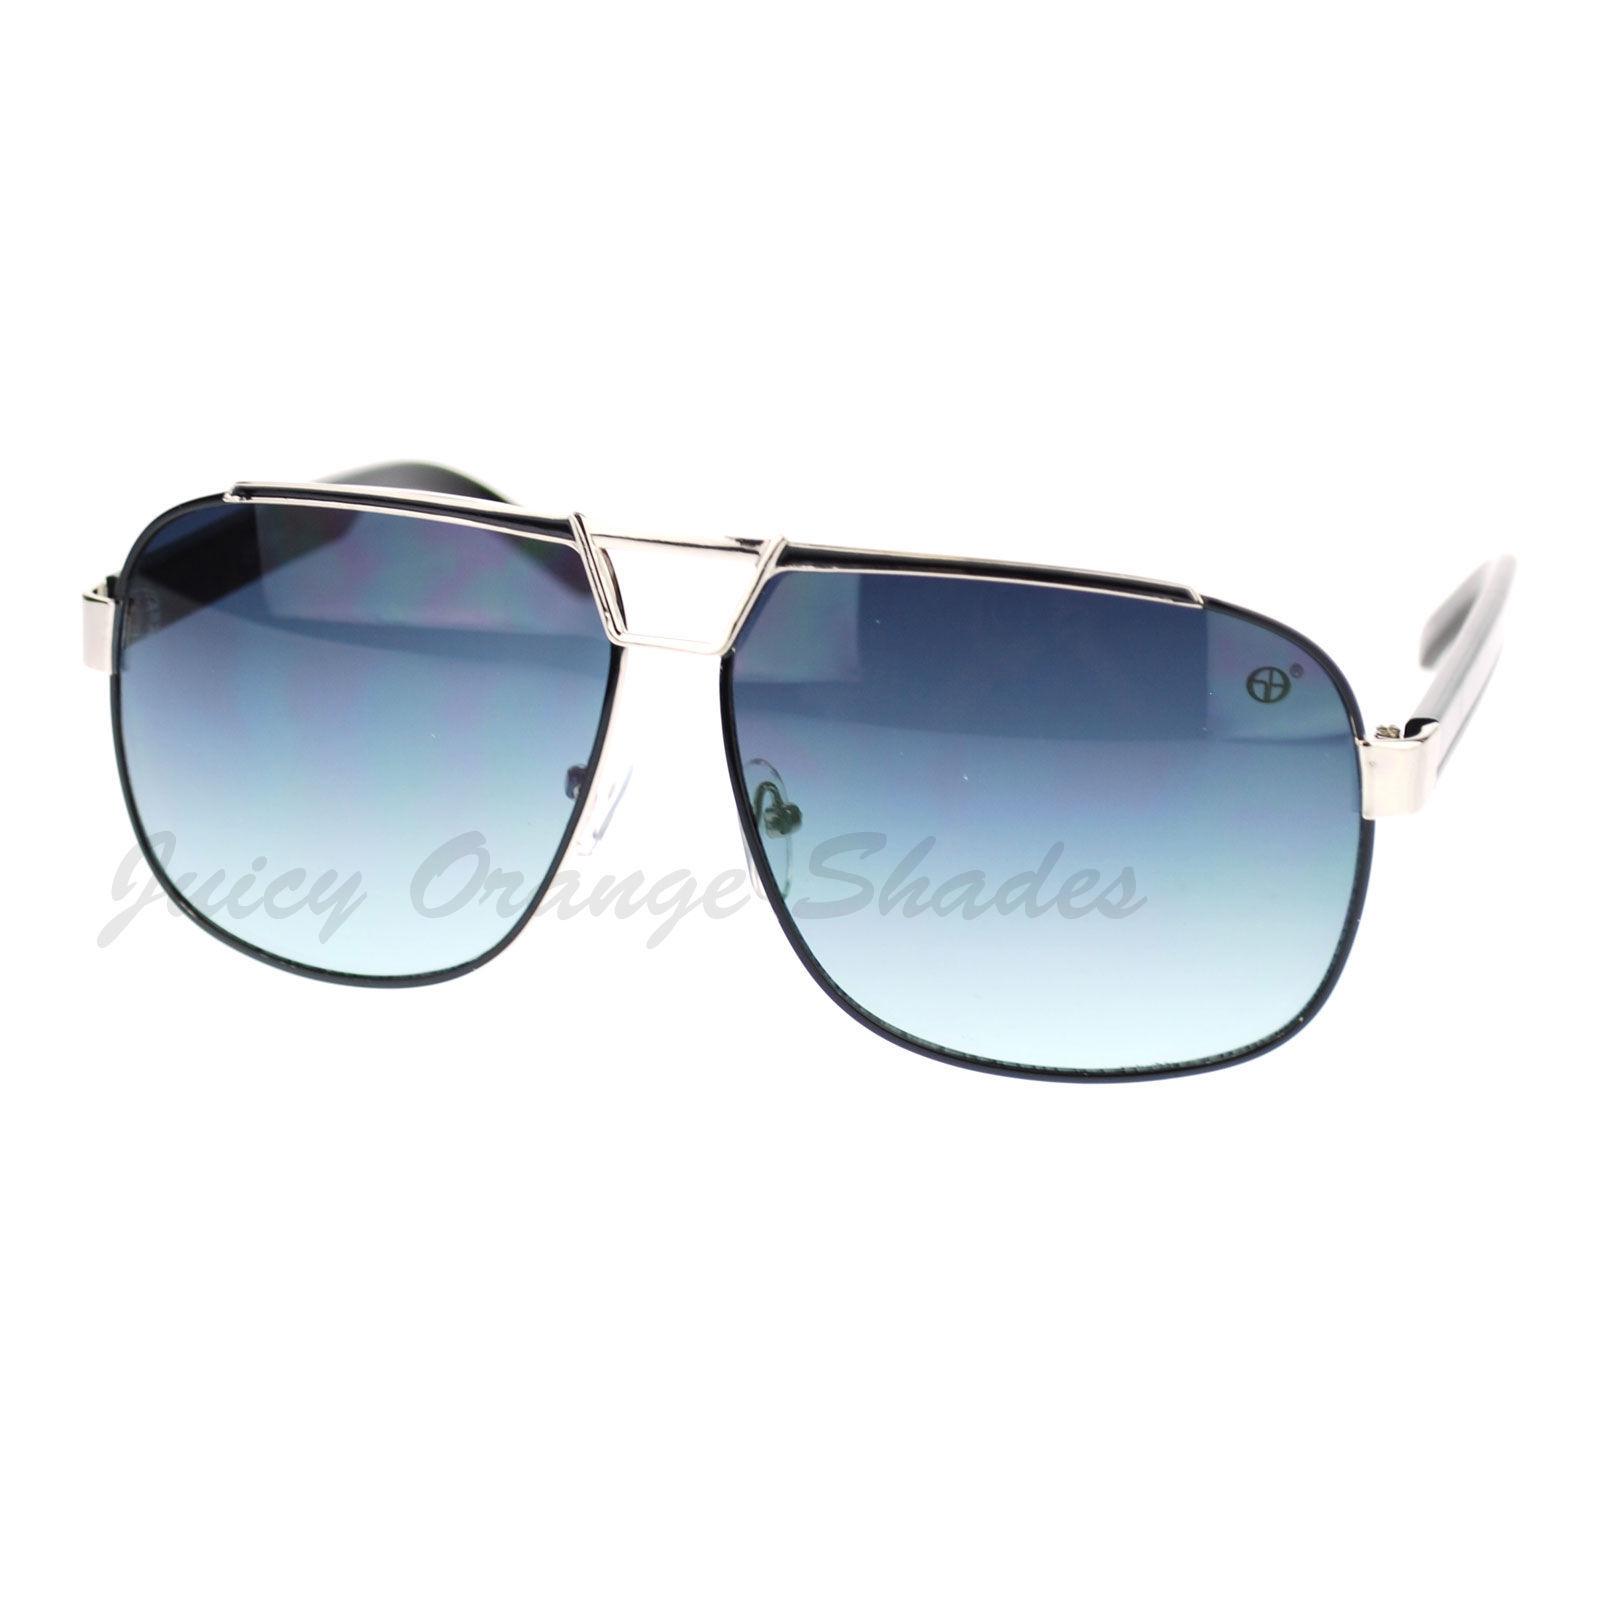 Designer Navigator Sunglasses Unisex Fashion Square Aviators